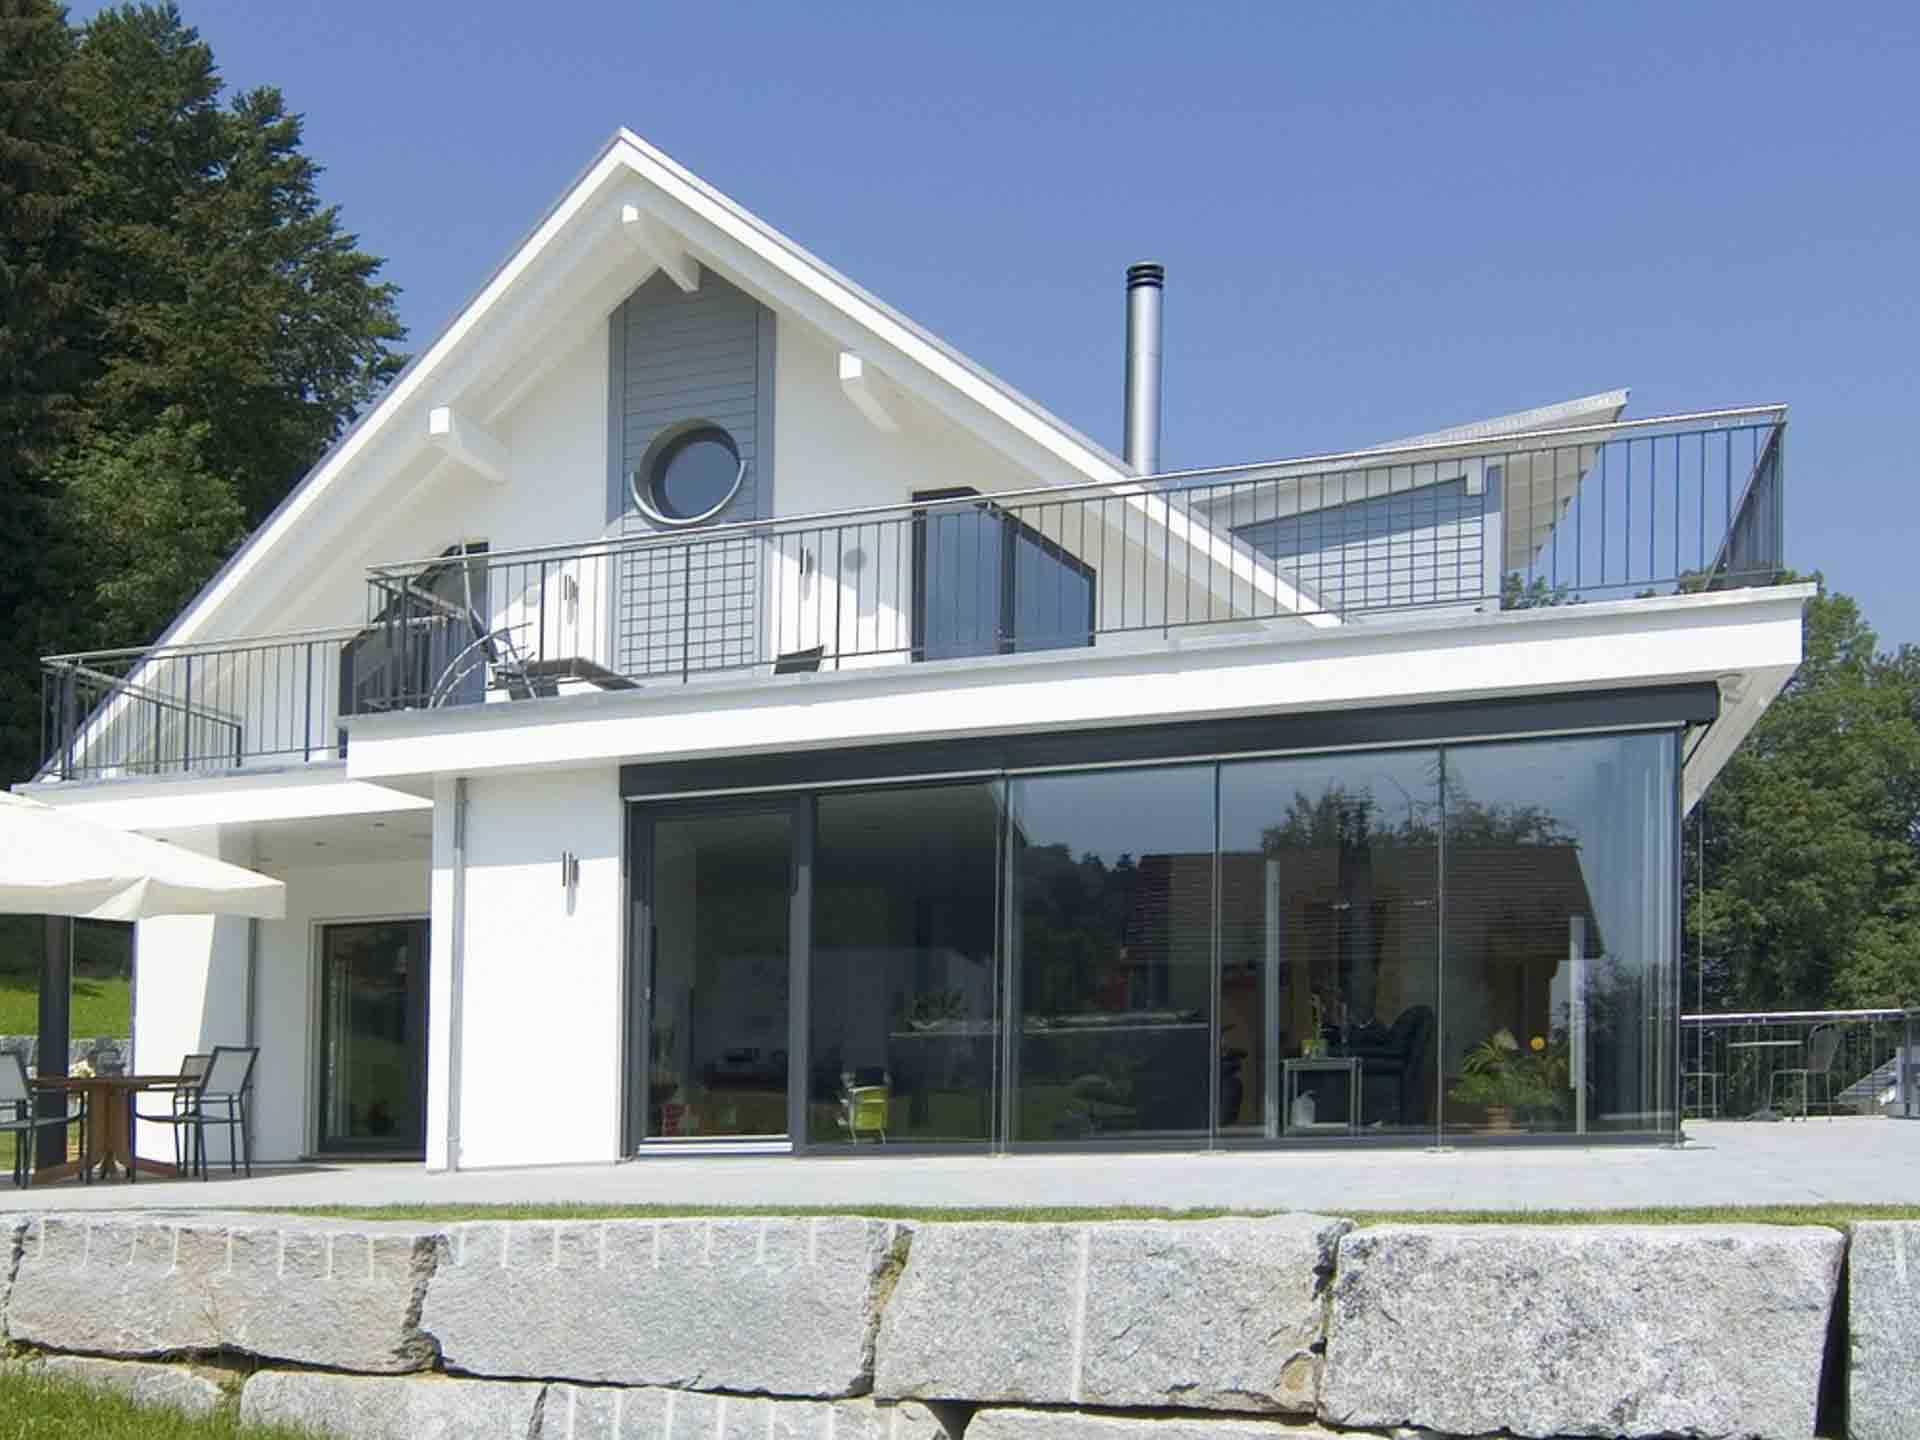 Einfamilienhaus mit Hanglage - WeberHaus | Musterhaus.net